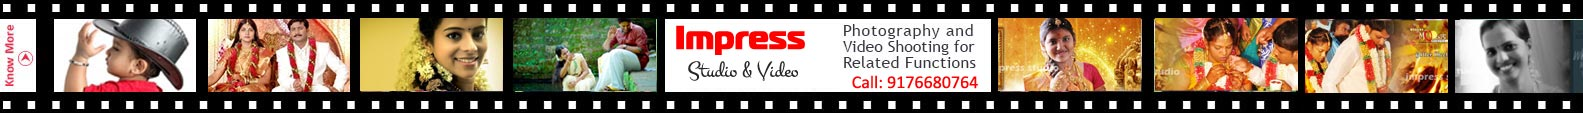 Bodinayakanur-HD-Videography-Service